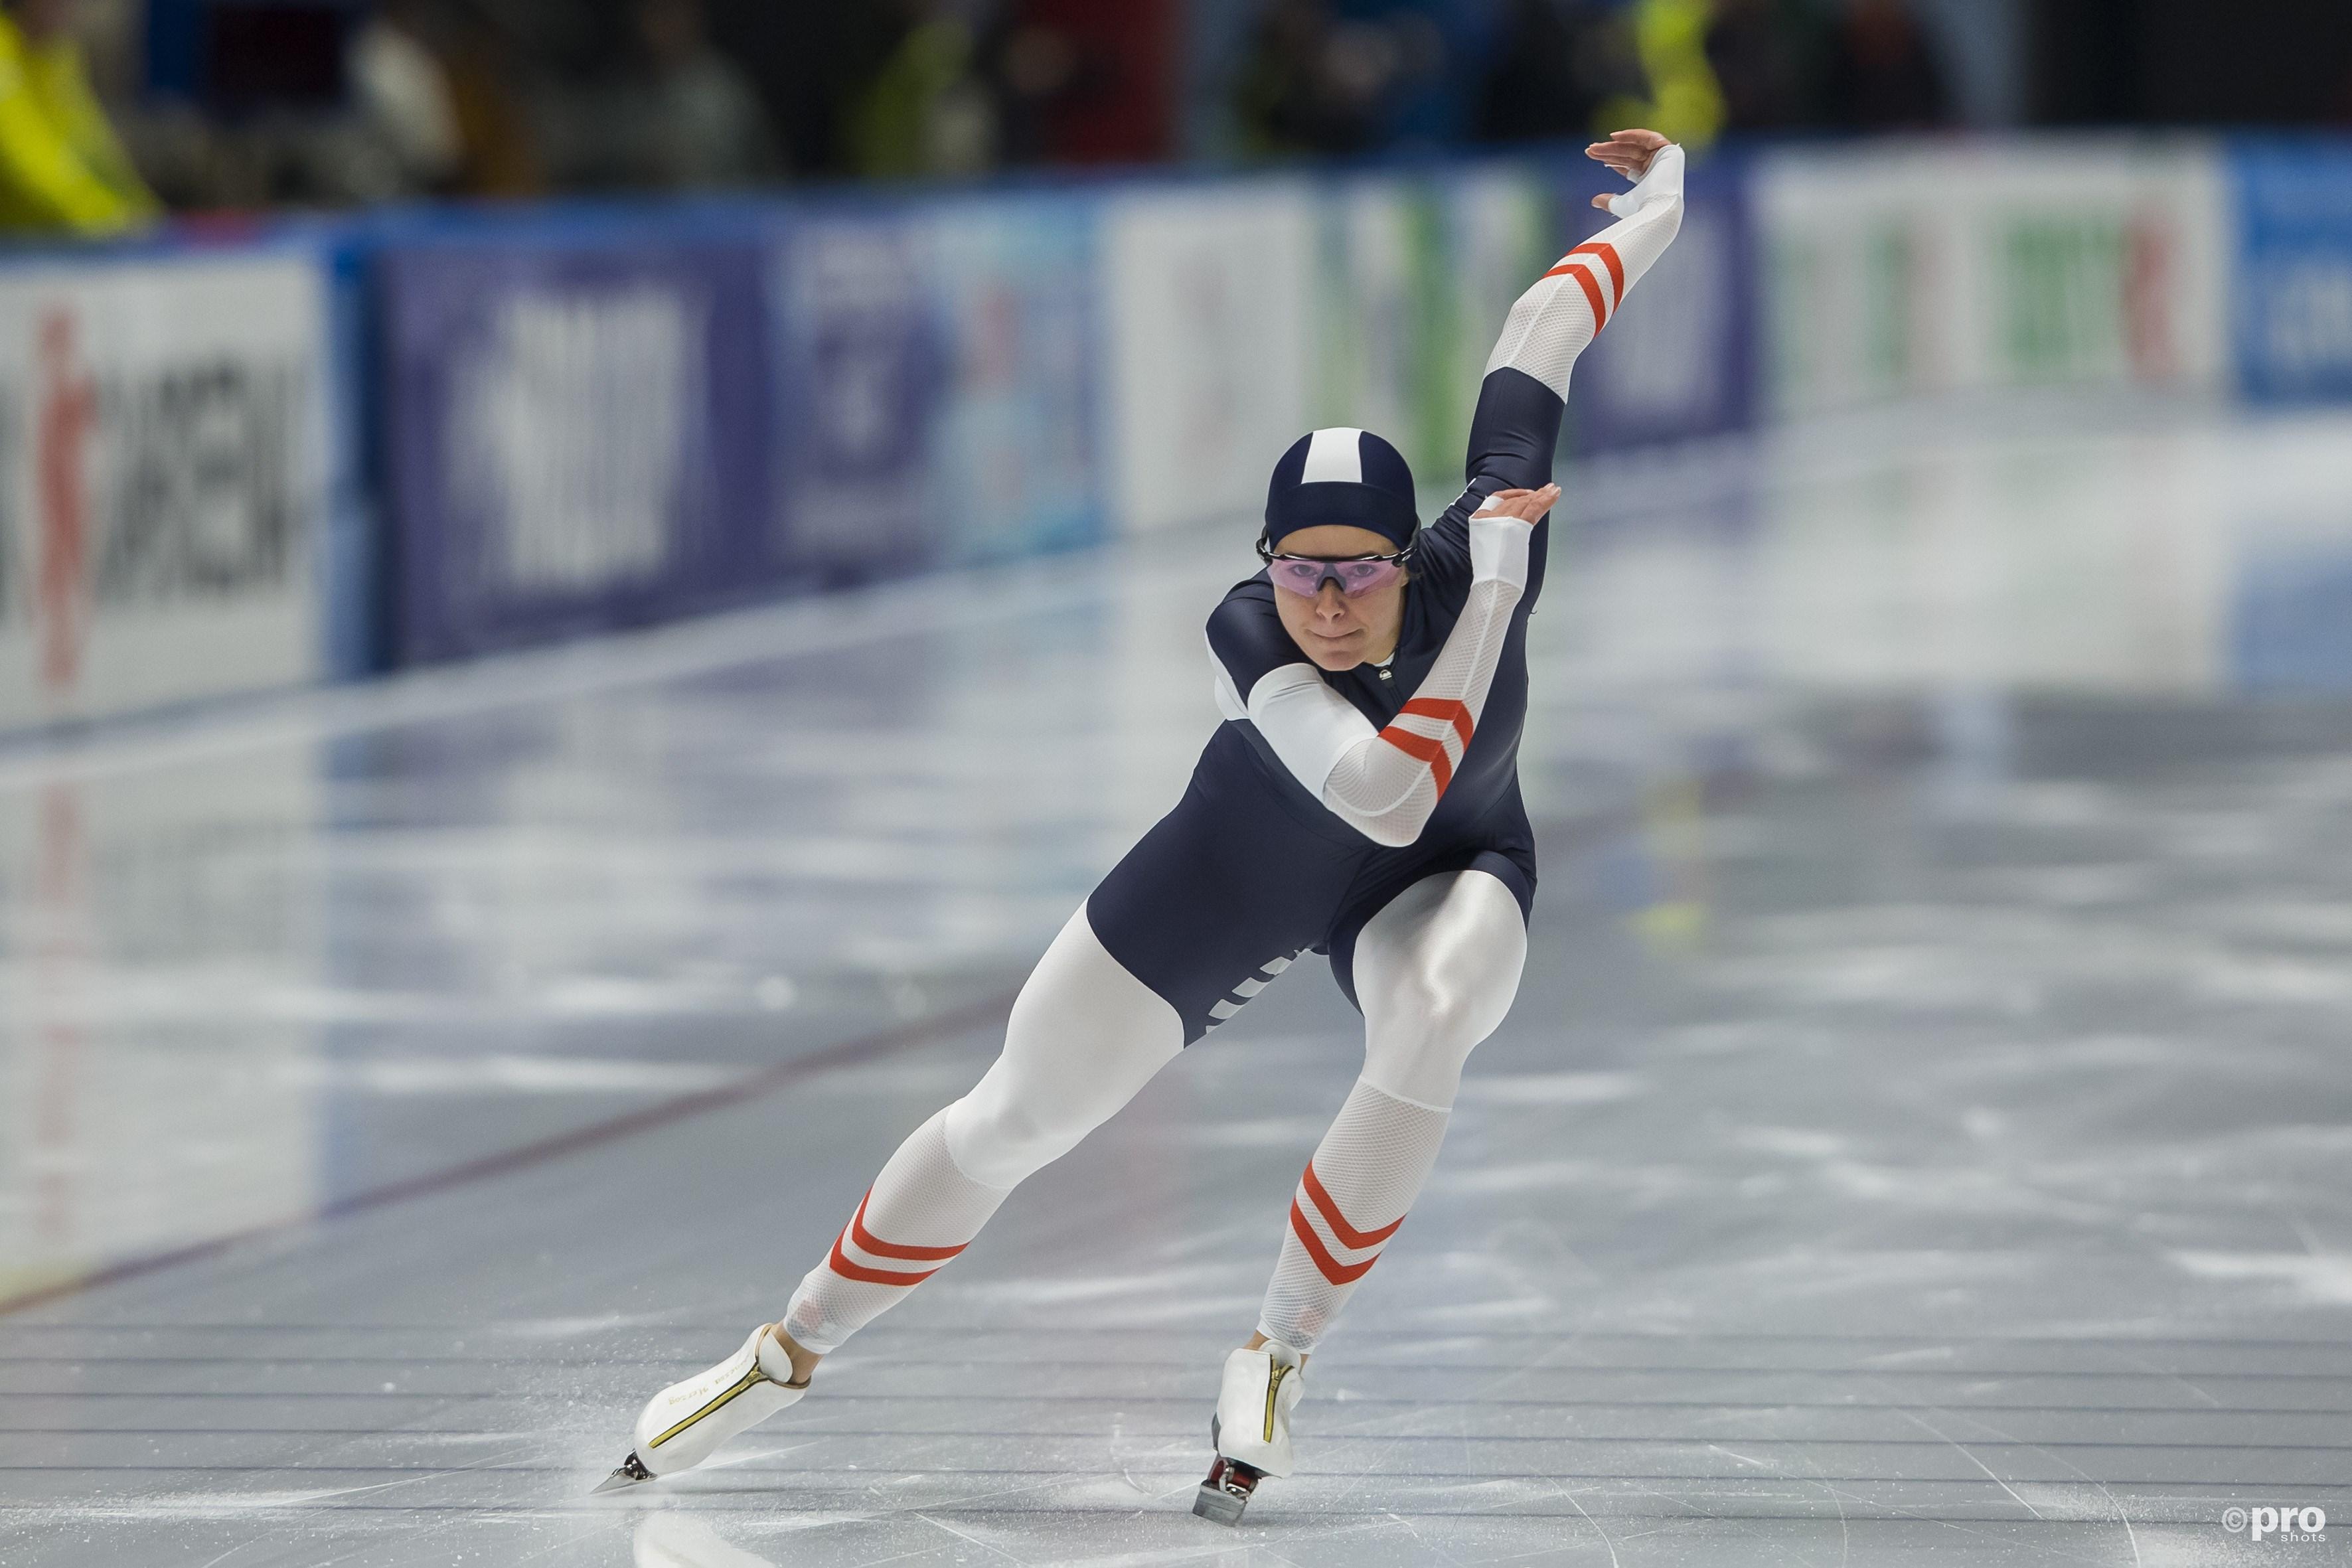 Herzog is Europees kampioen sprint. (PRO SHOTS/Erik Pasman)